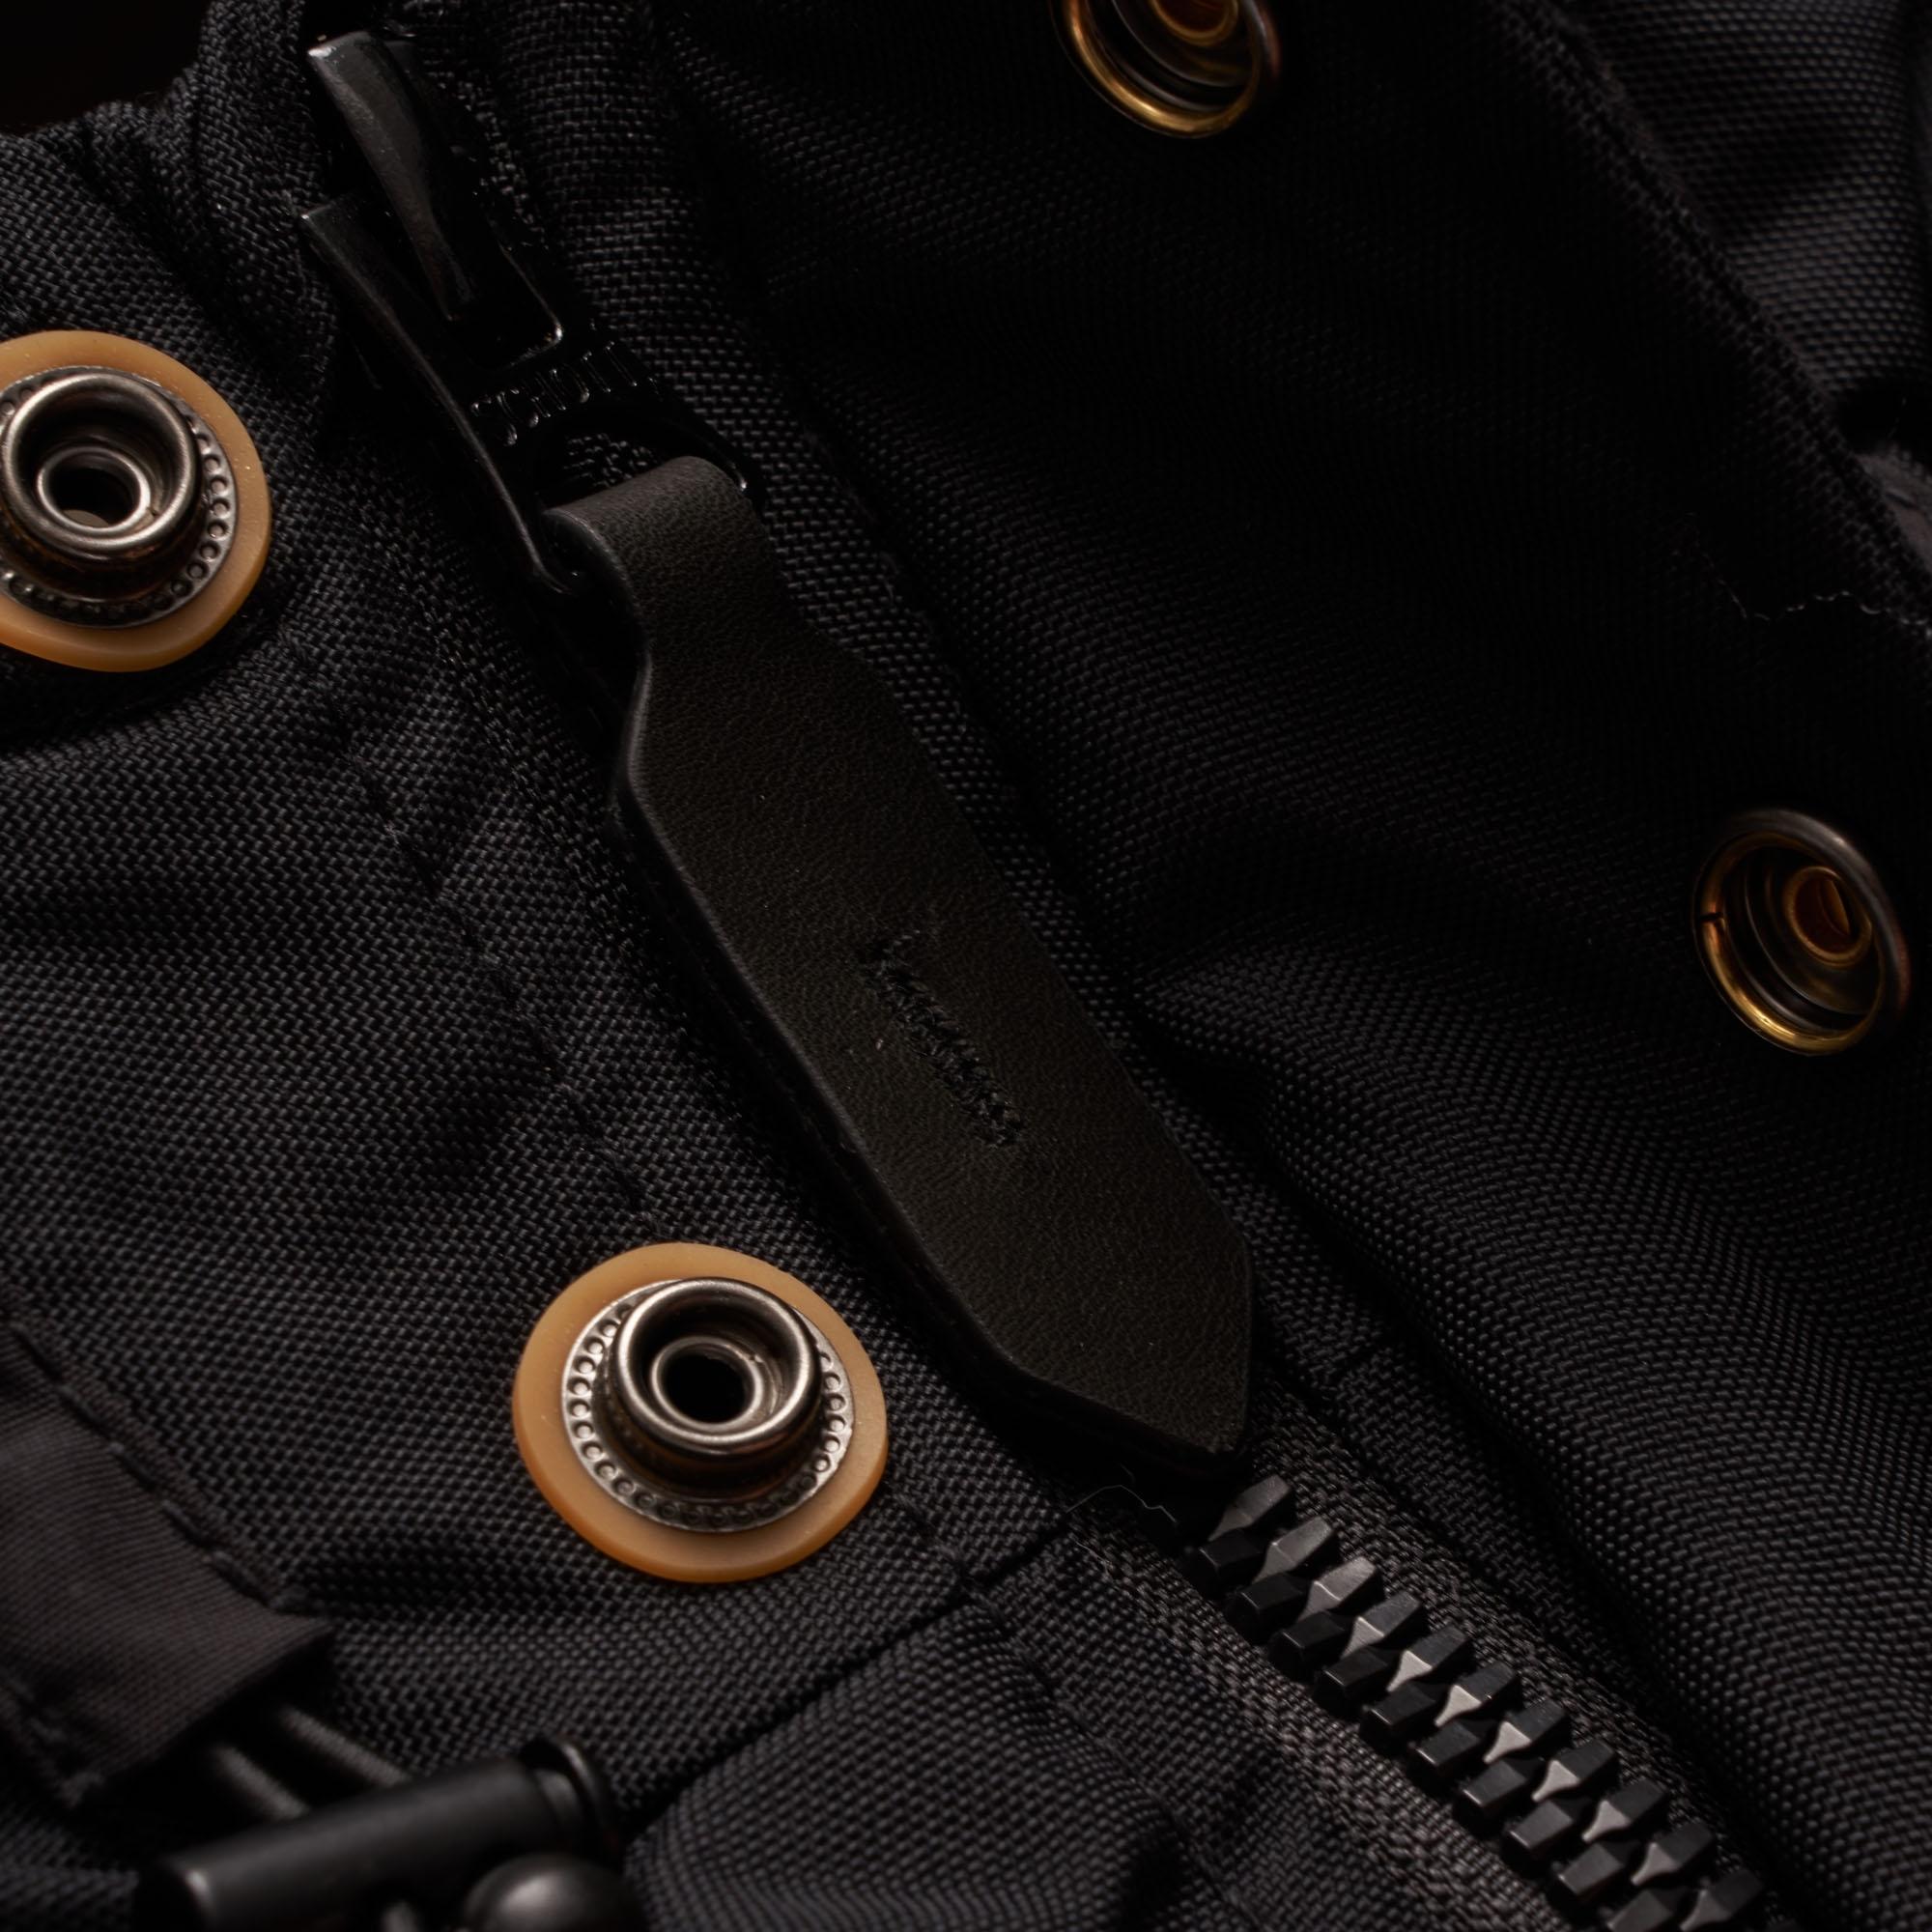 c9991bab2 Husky 18 Smock Jacket - Black